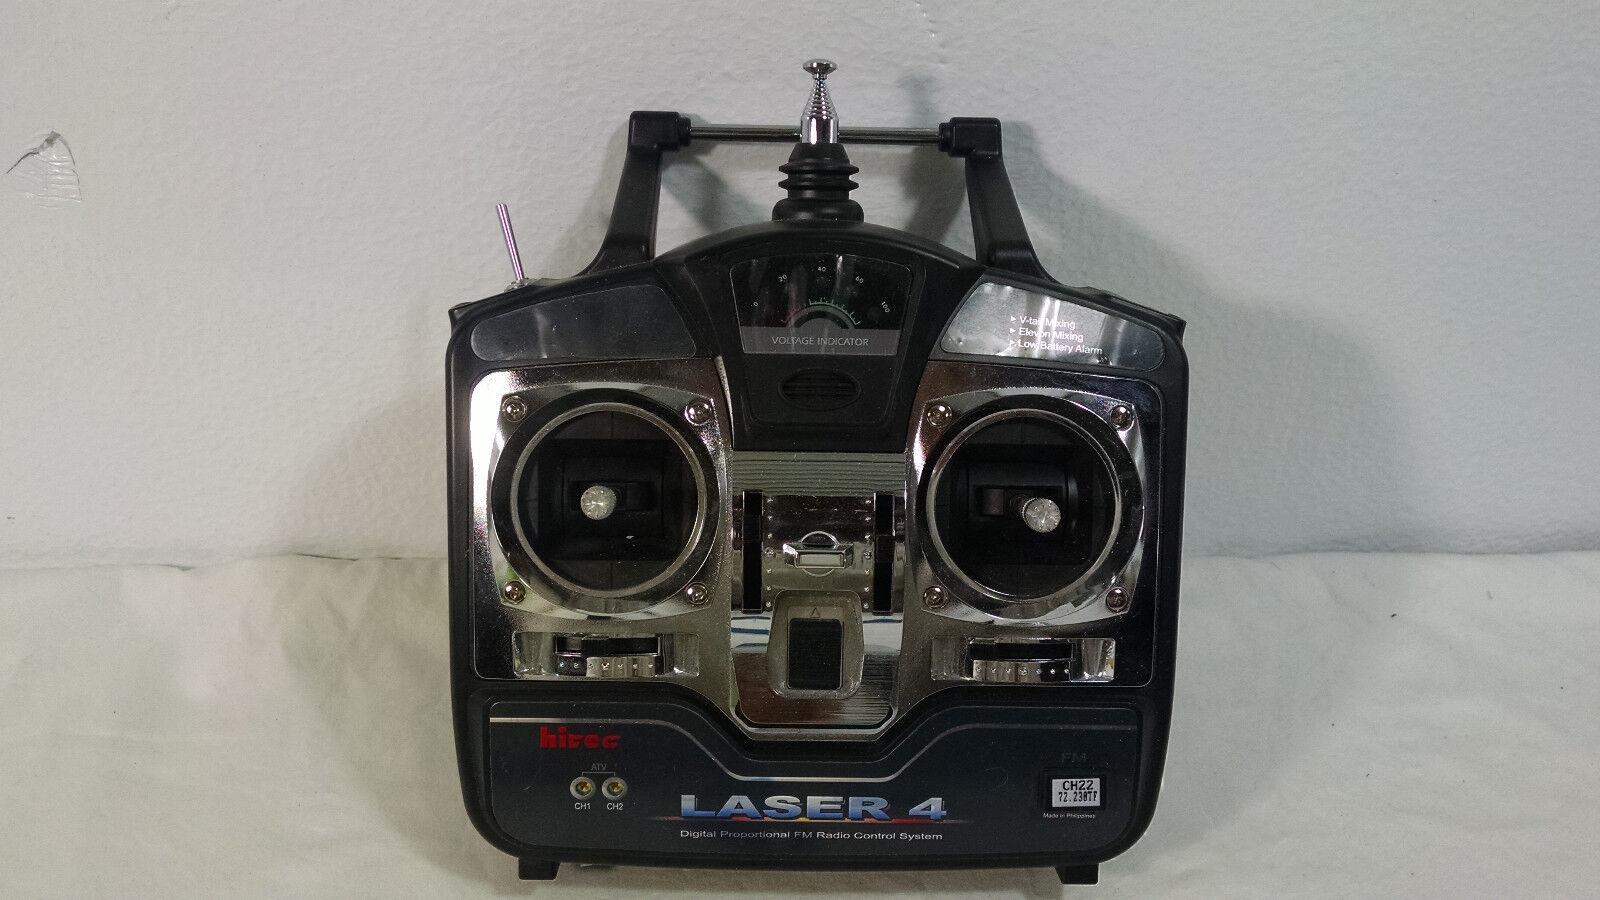 LASER 4 REMOTE CONTROL HITEC HITECH DIGITAL PROPORTIONAL FM RADIO SYSTEM